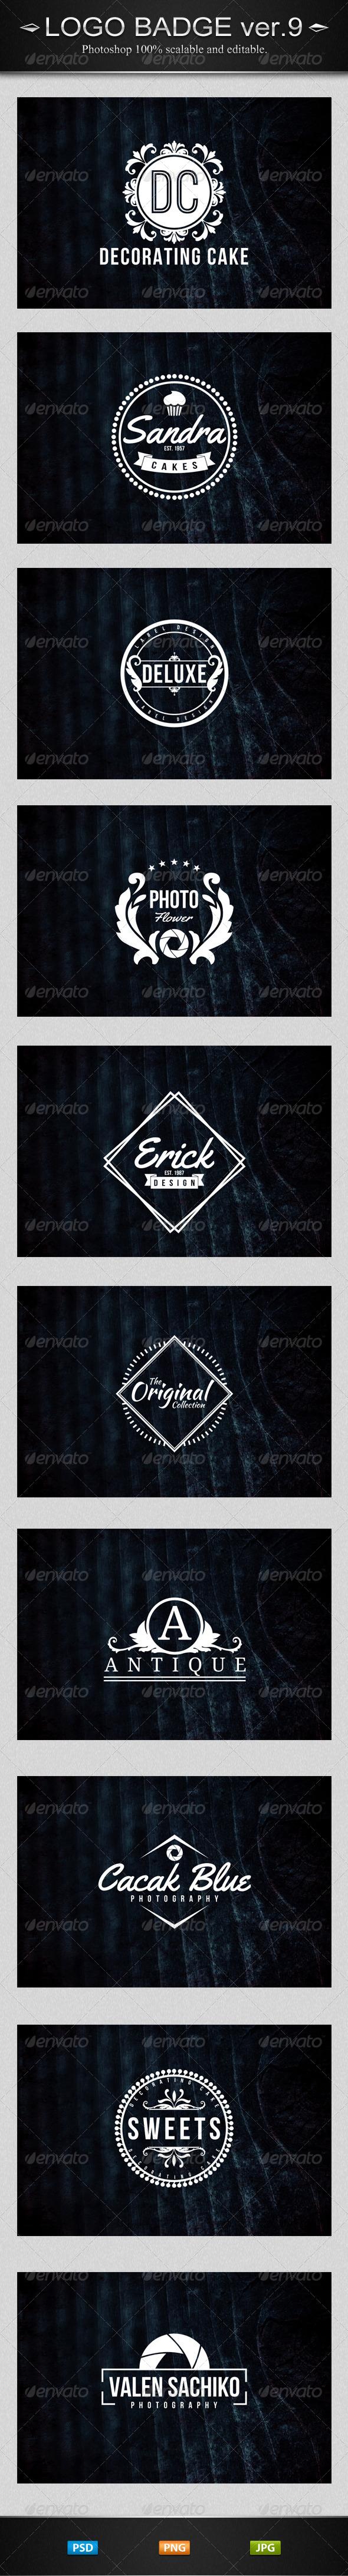 GraphicRiver 10 Vintage Logo Ver.9 Badges Insignias & Crest 7903602